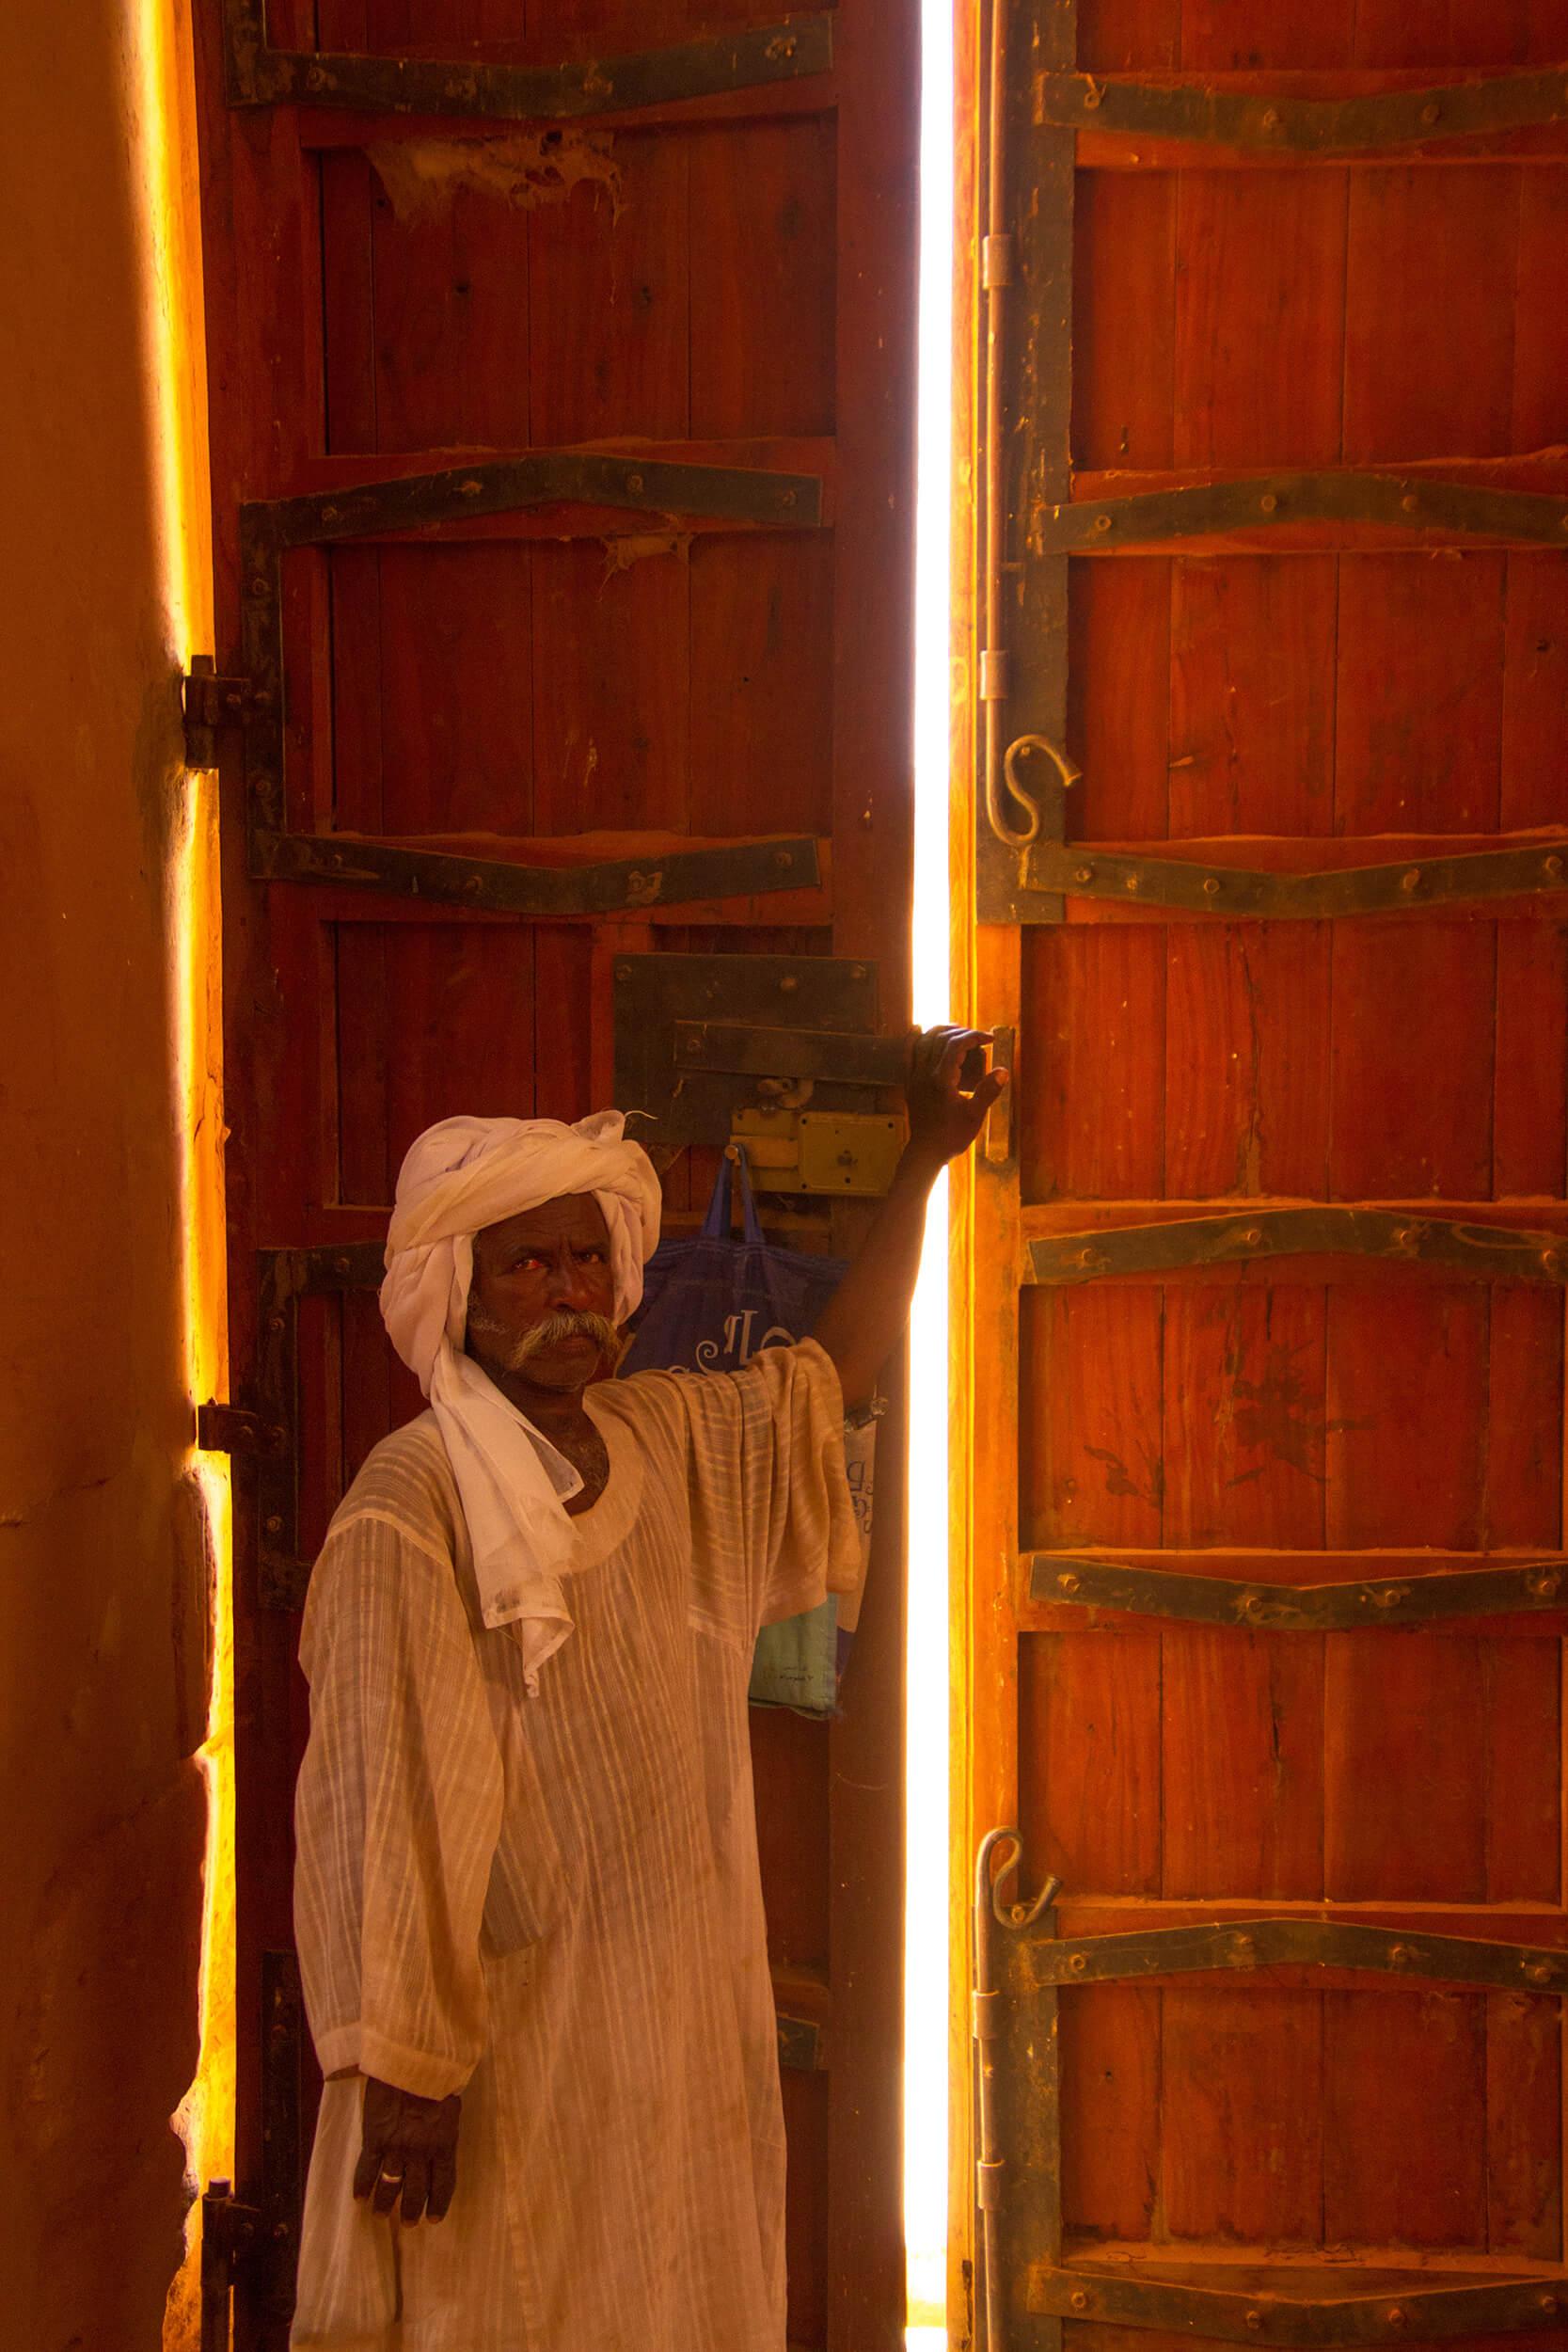 https://bubo.sk/uploads/galleries/7407/marekmeluch_sudan_mussawaratessufra1.jpg